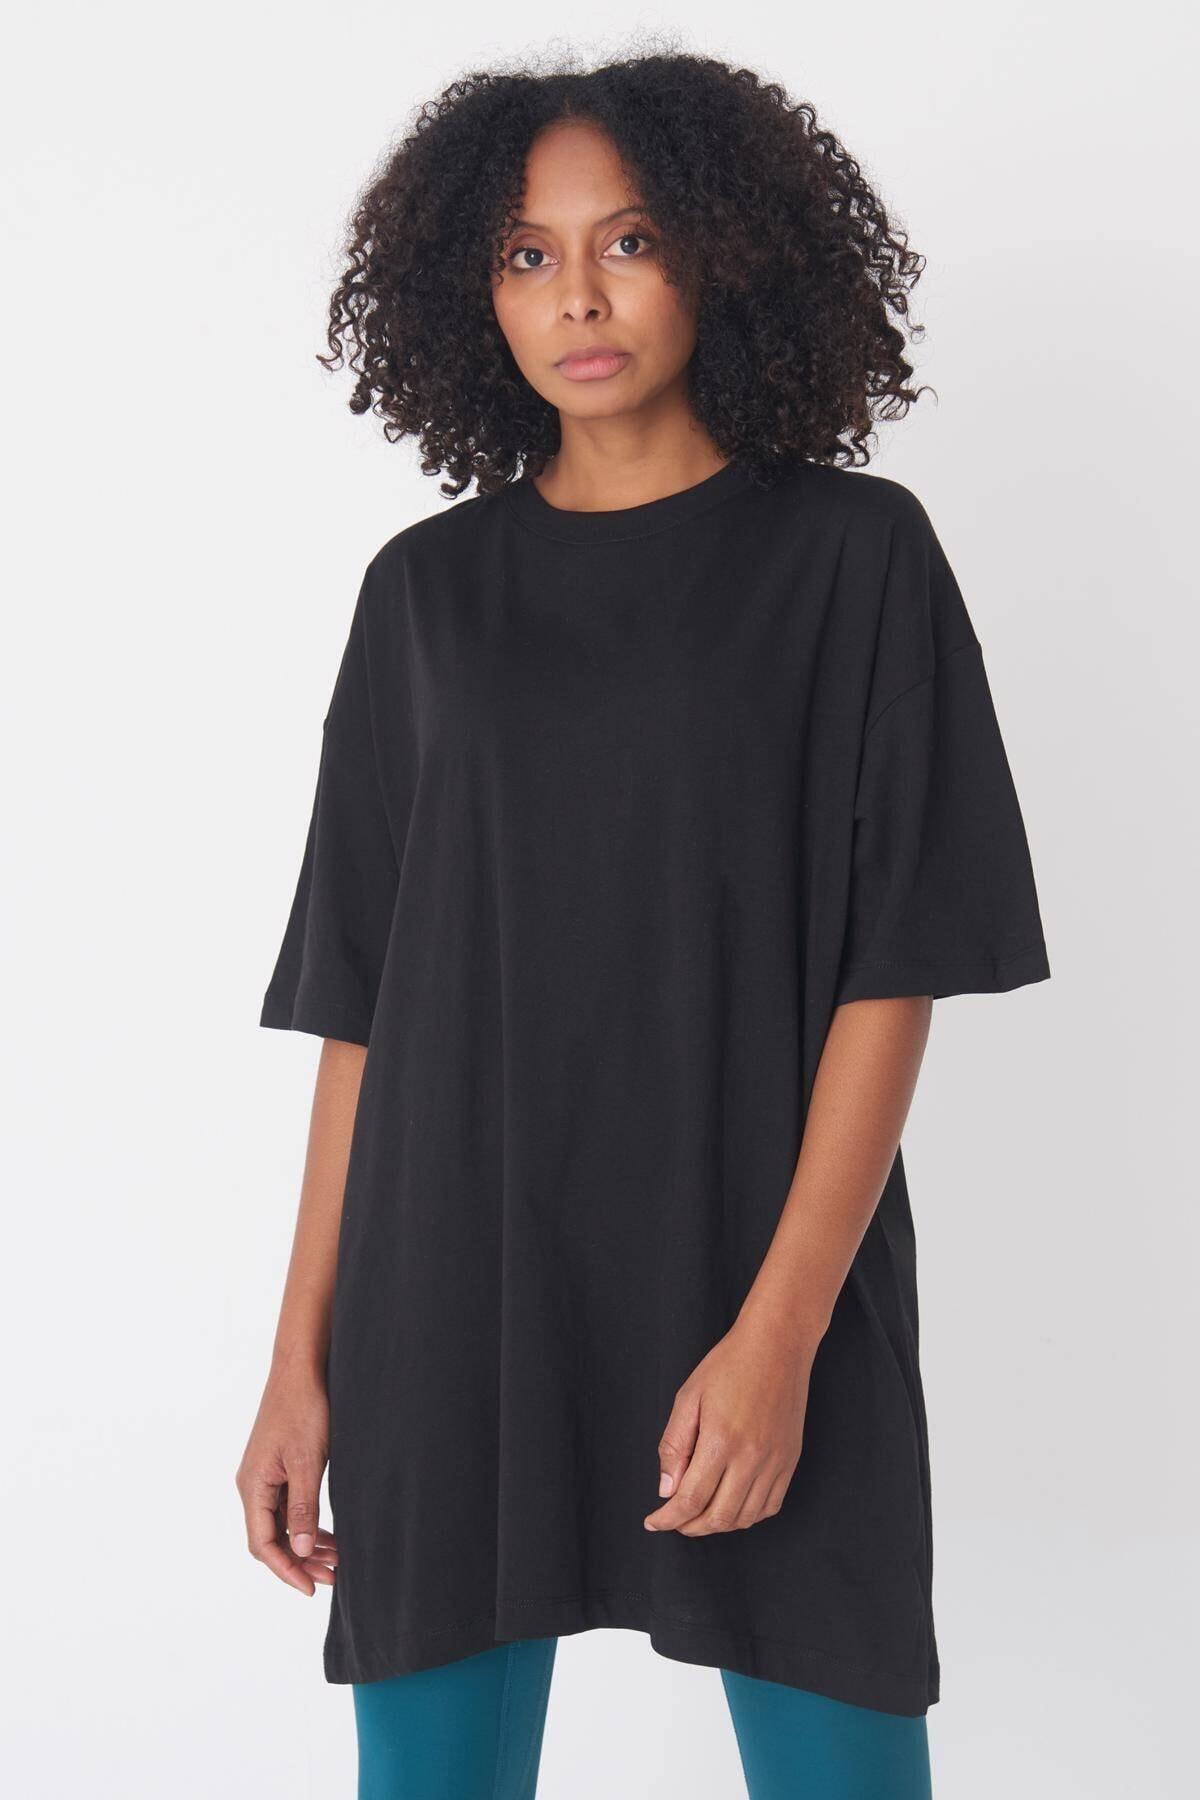 Addax Kadın Siyah Oversize Tişört P0731 - G6 - K7 ADX-0000020596 1